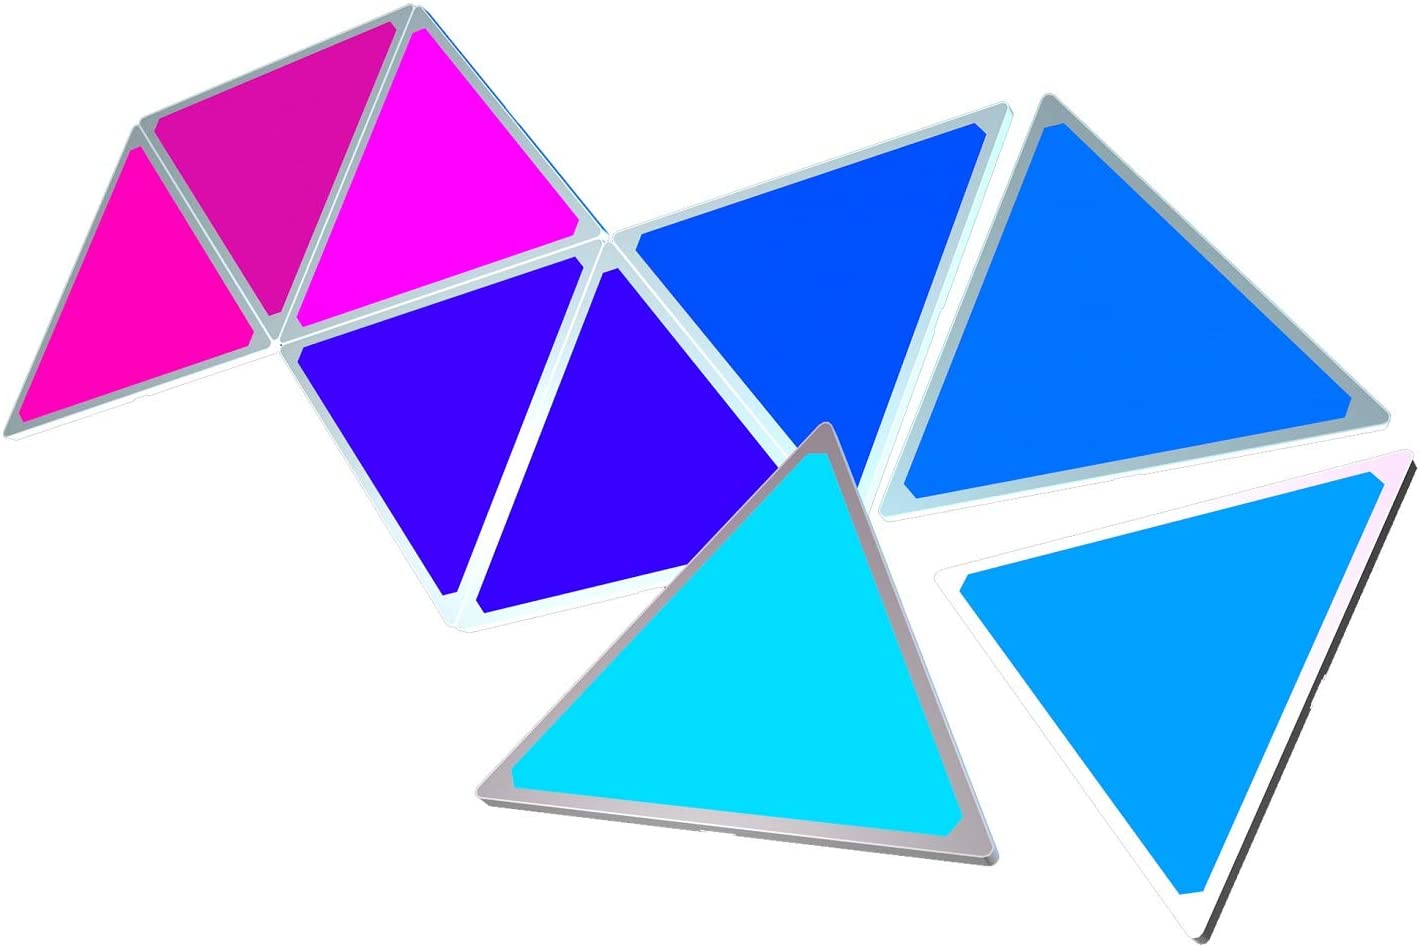 Smart LED Wall Light Tiles Light Panels WiFi Lighting Lamp Rhythm Edition Smarter Kit for Office Home Decoration enlarge